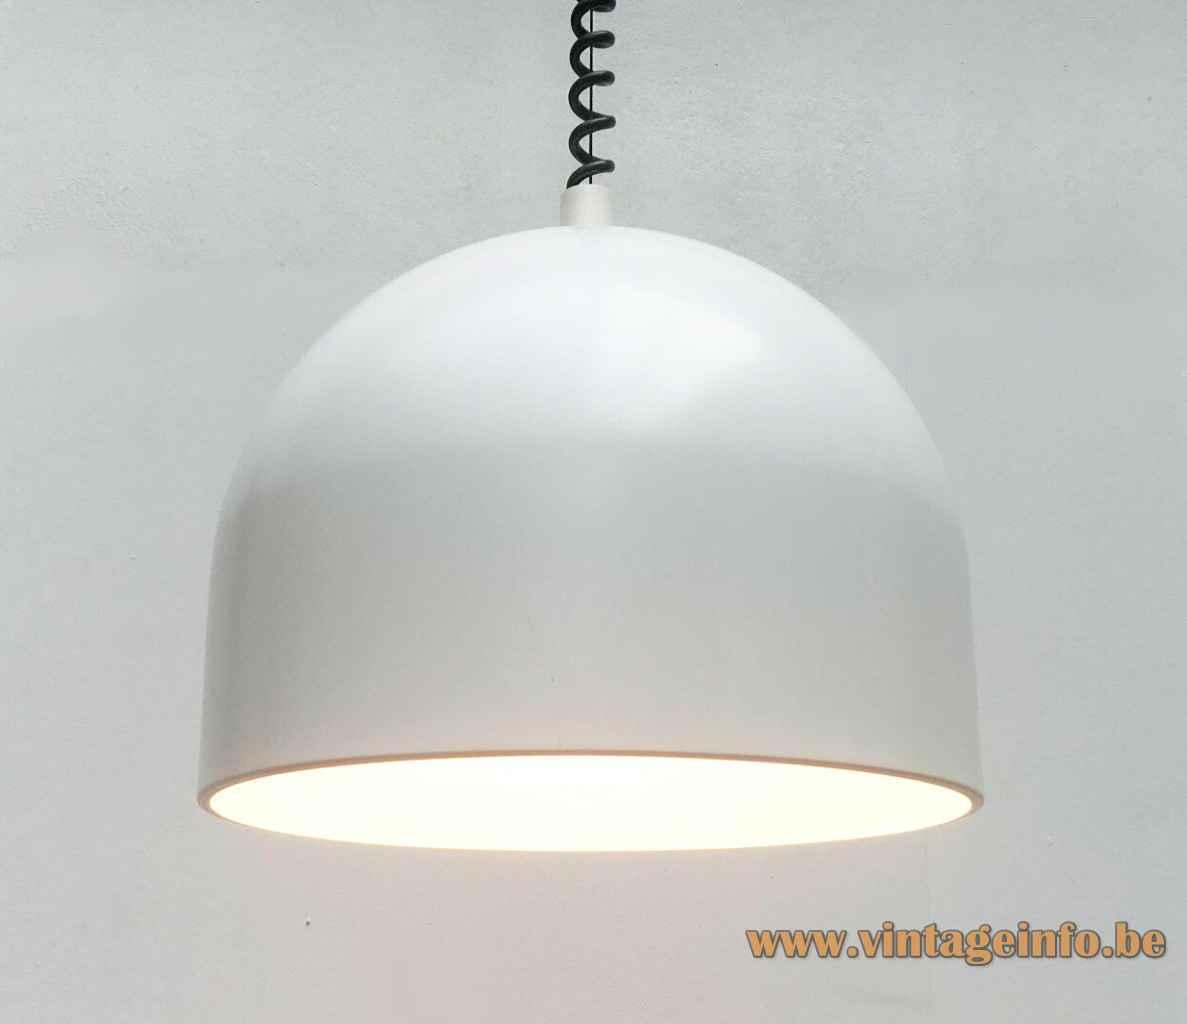 Staff pendant lamp 5515 half round white metal lampshade aluminium reflector 1970s 1980s Germany E27 socket